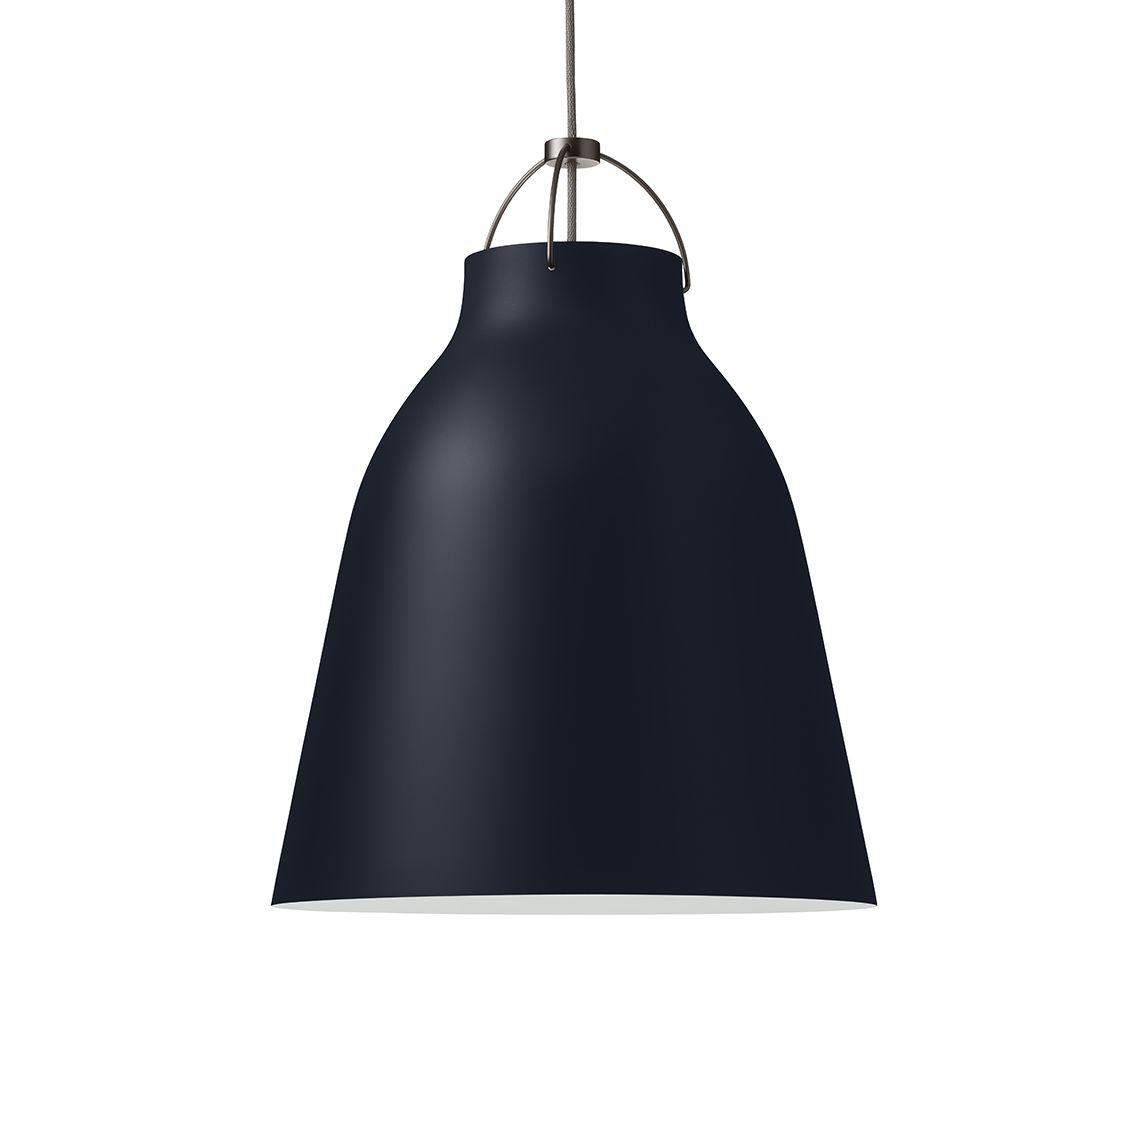 Caravaggio hanglamp Lightyears Ø26 Dark Ultramarine